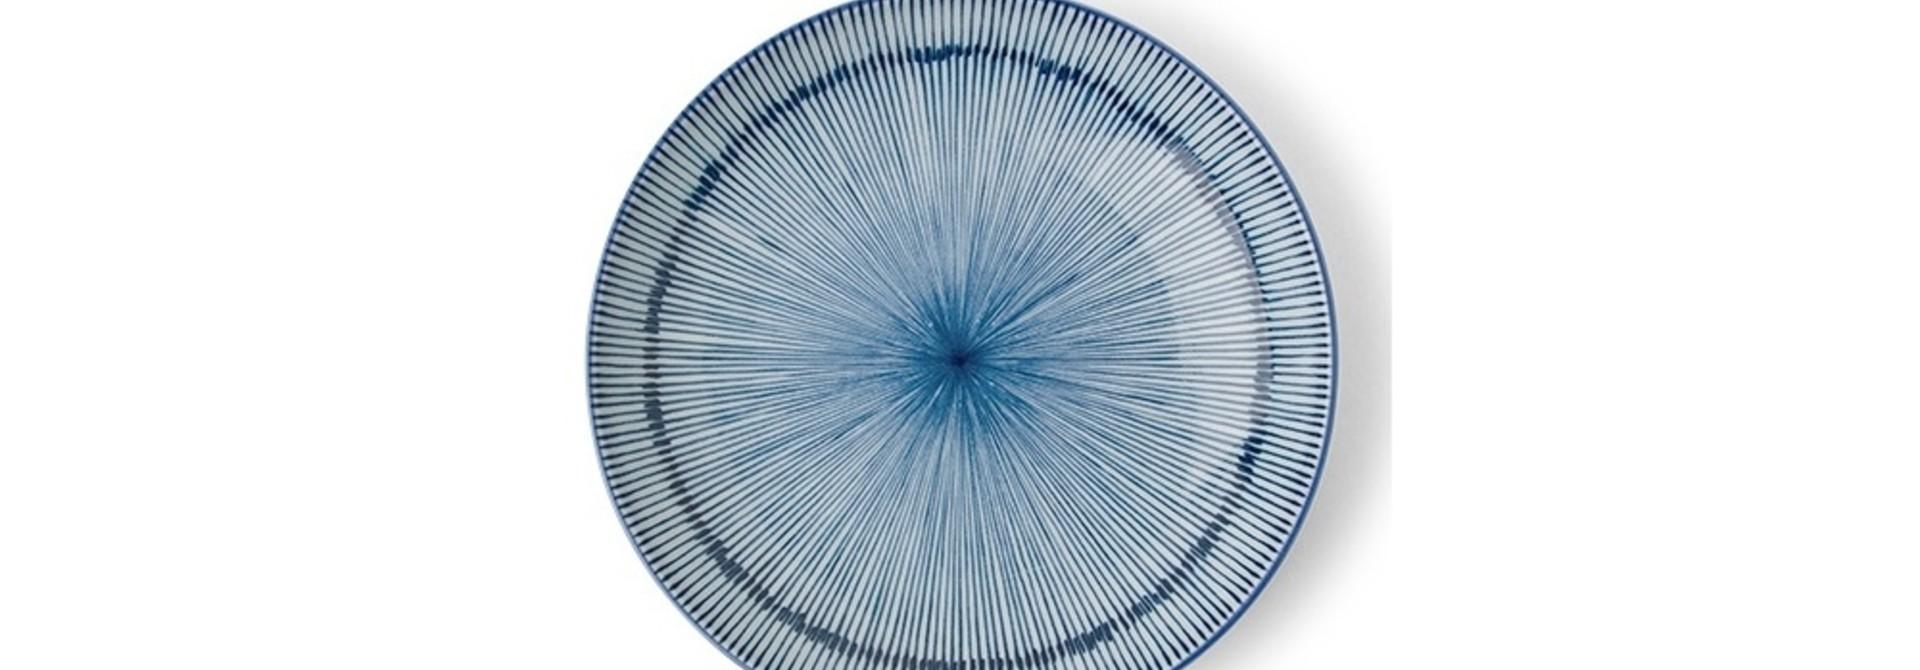 Hoso Tokusa - Plate